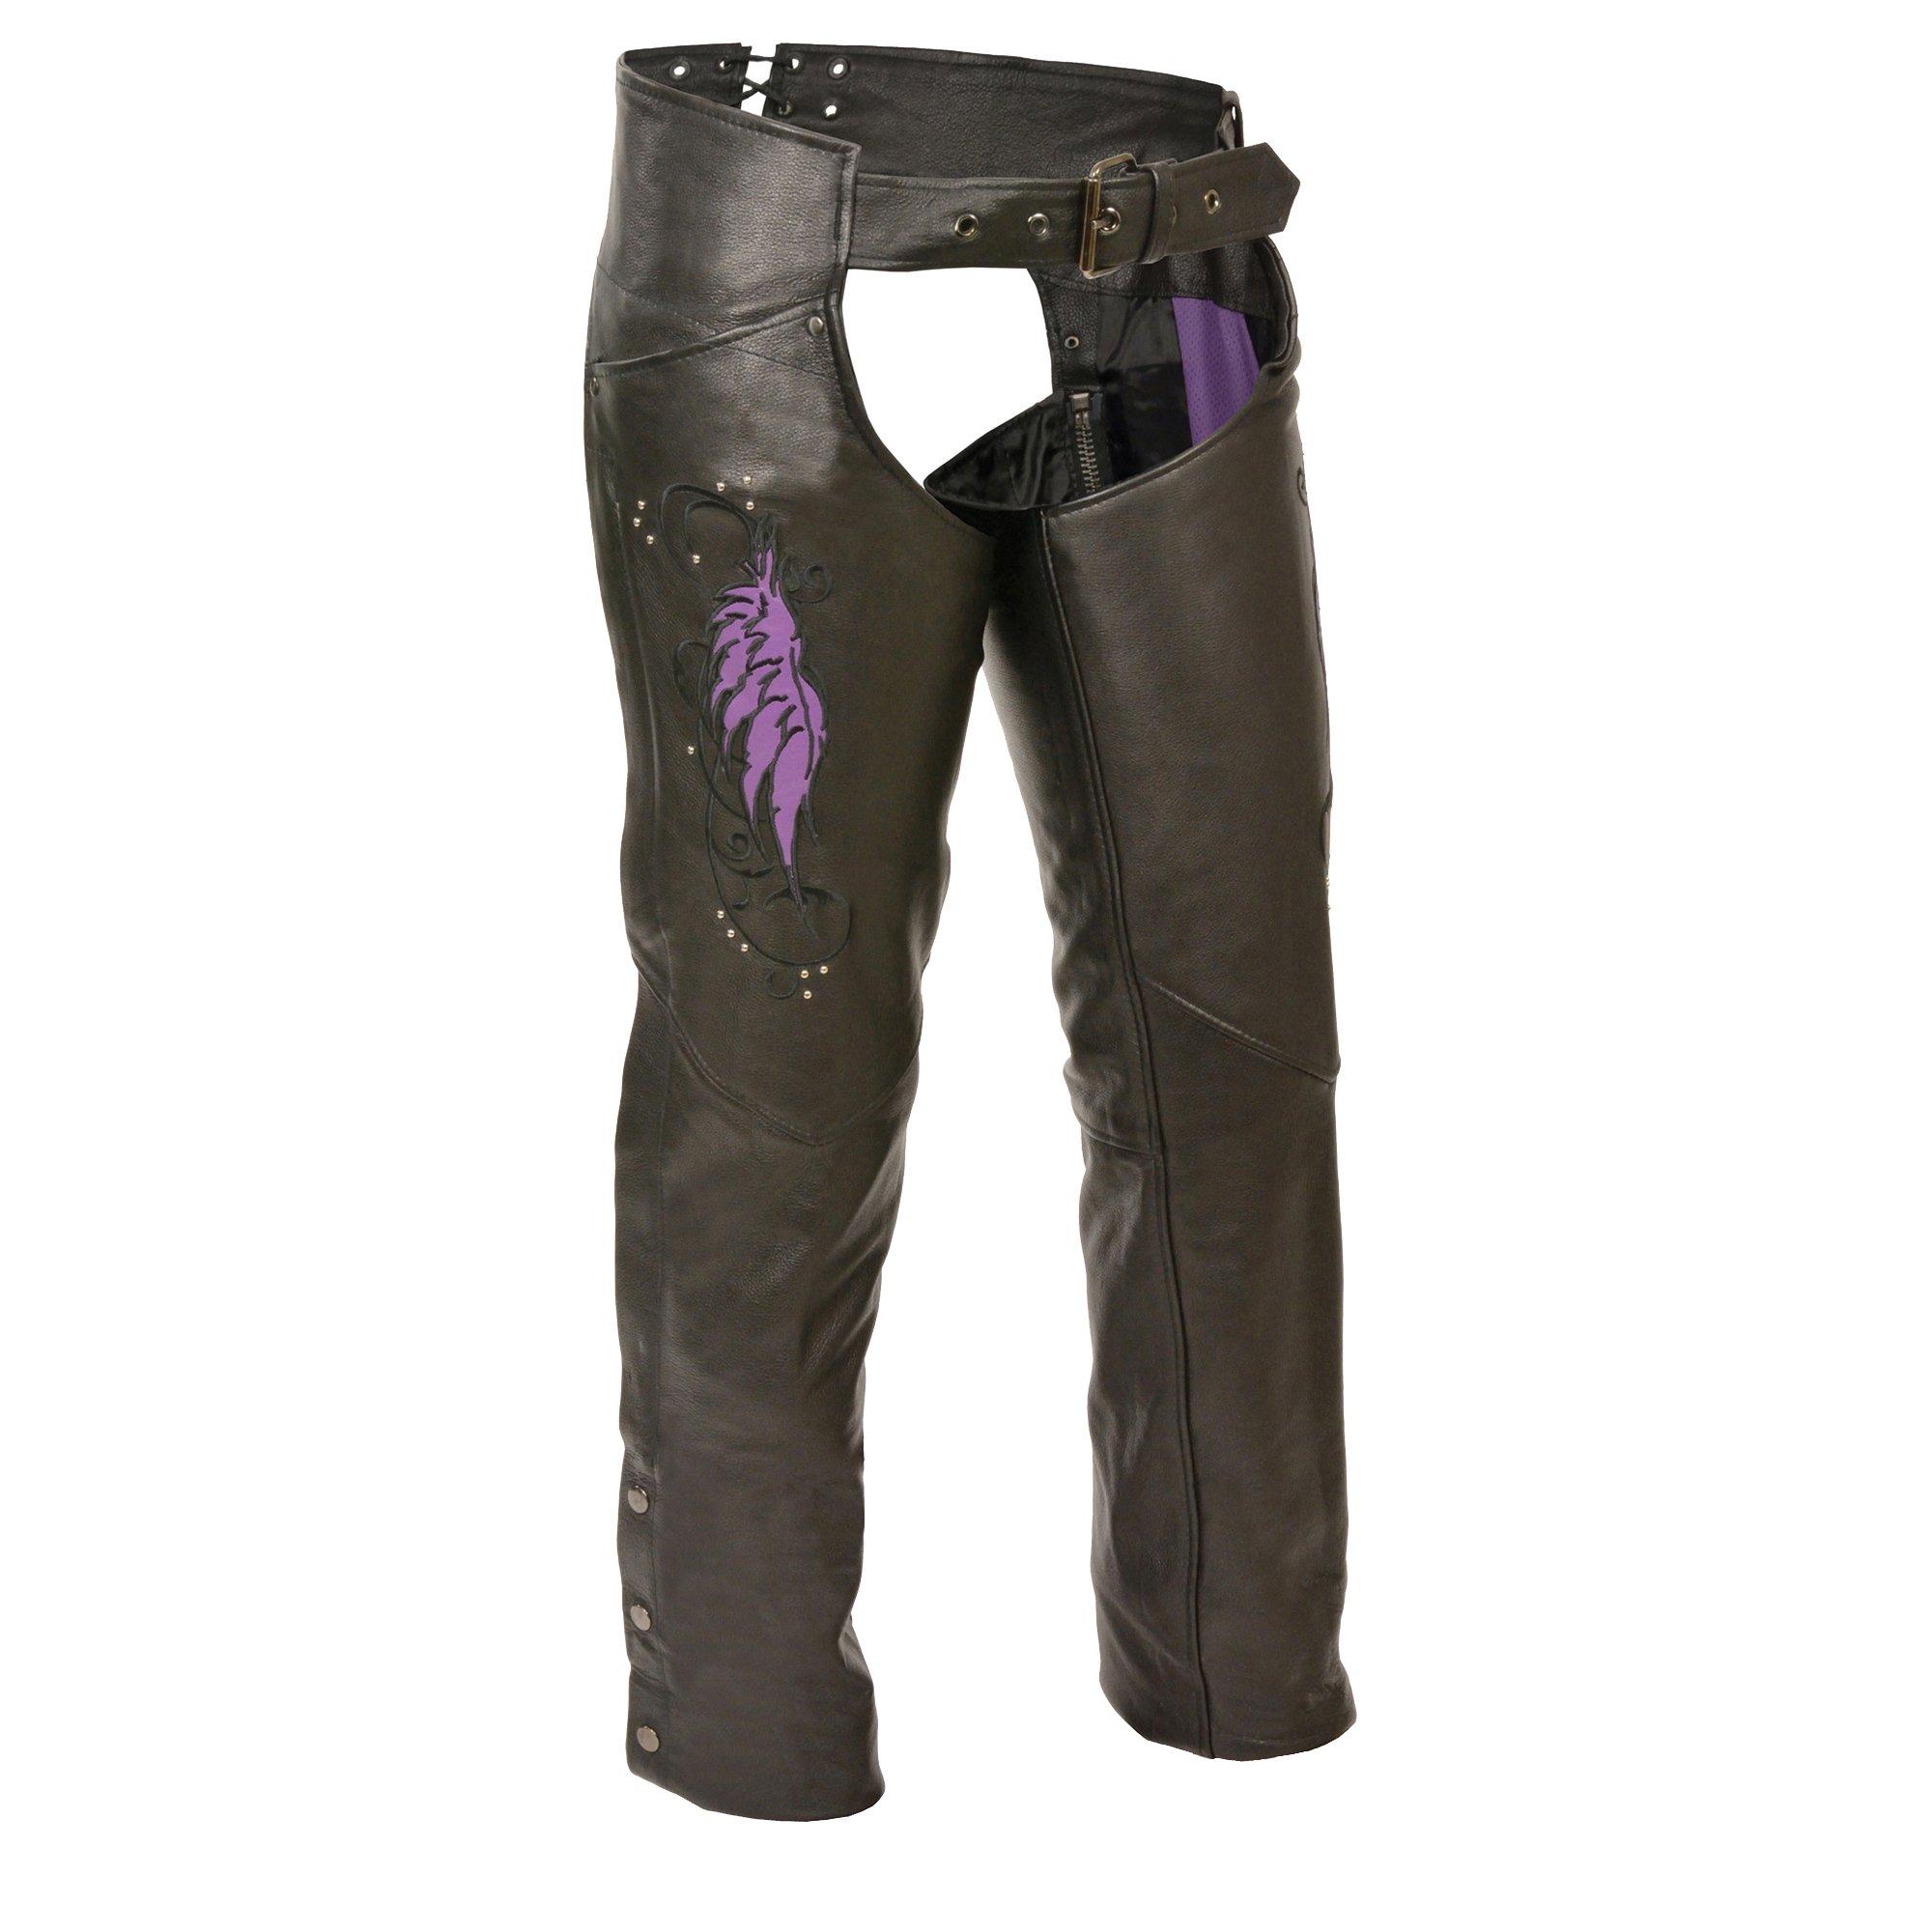 Milwaukee Women's Leather Chaps (Black/Purple, Large) by Milwaukee